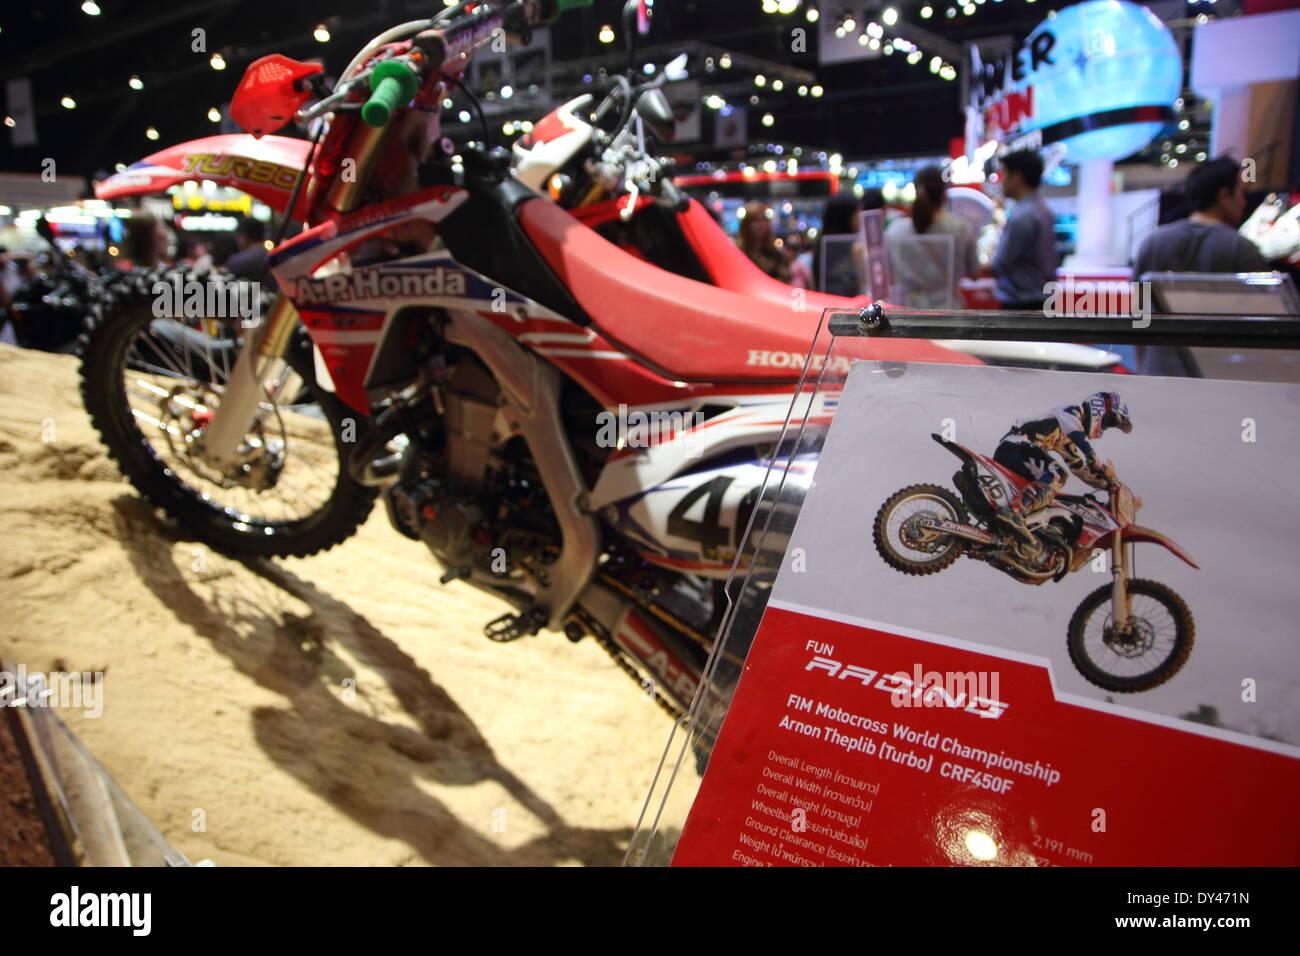 Motorcycle Car Brands Stock Photos & Motorcycle Car Brands